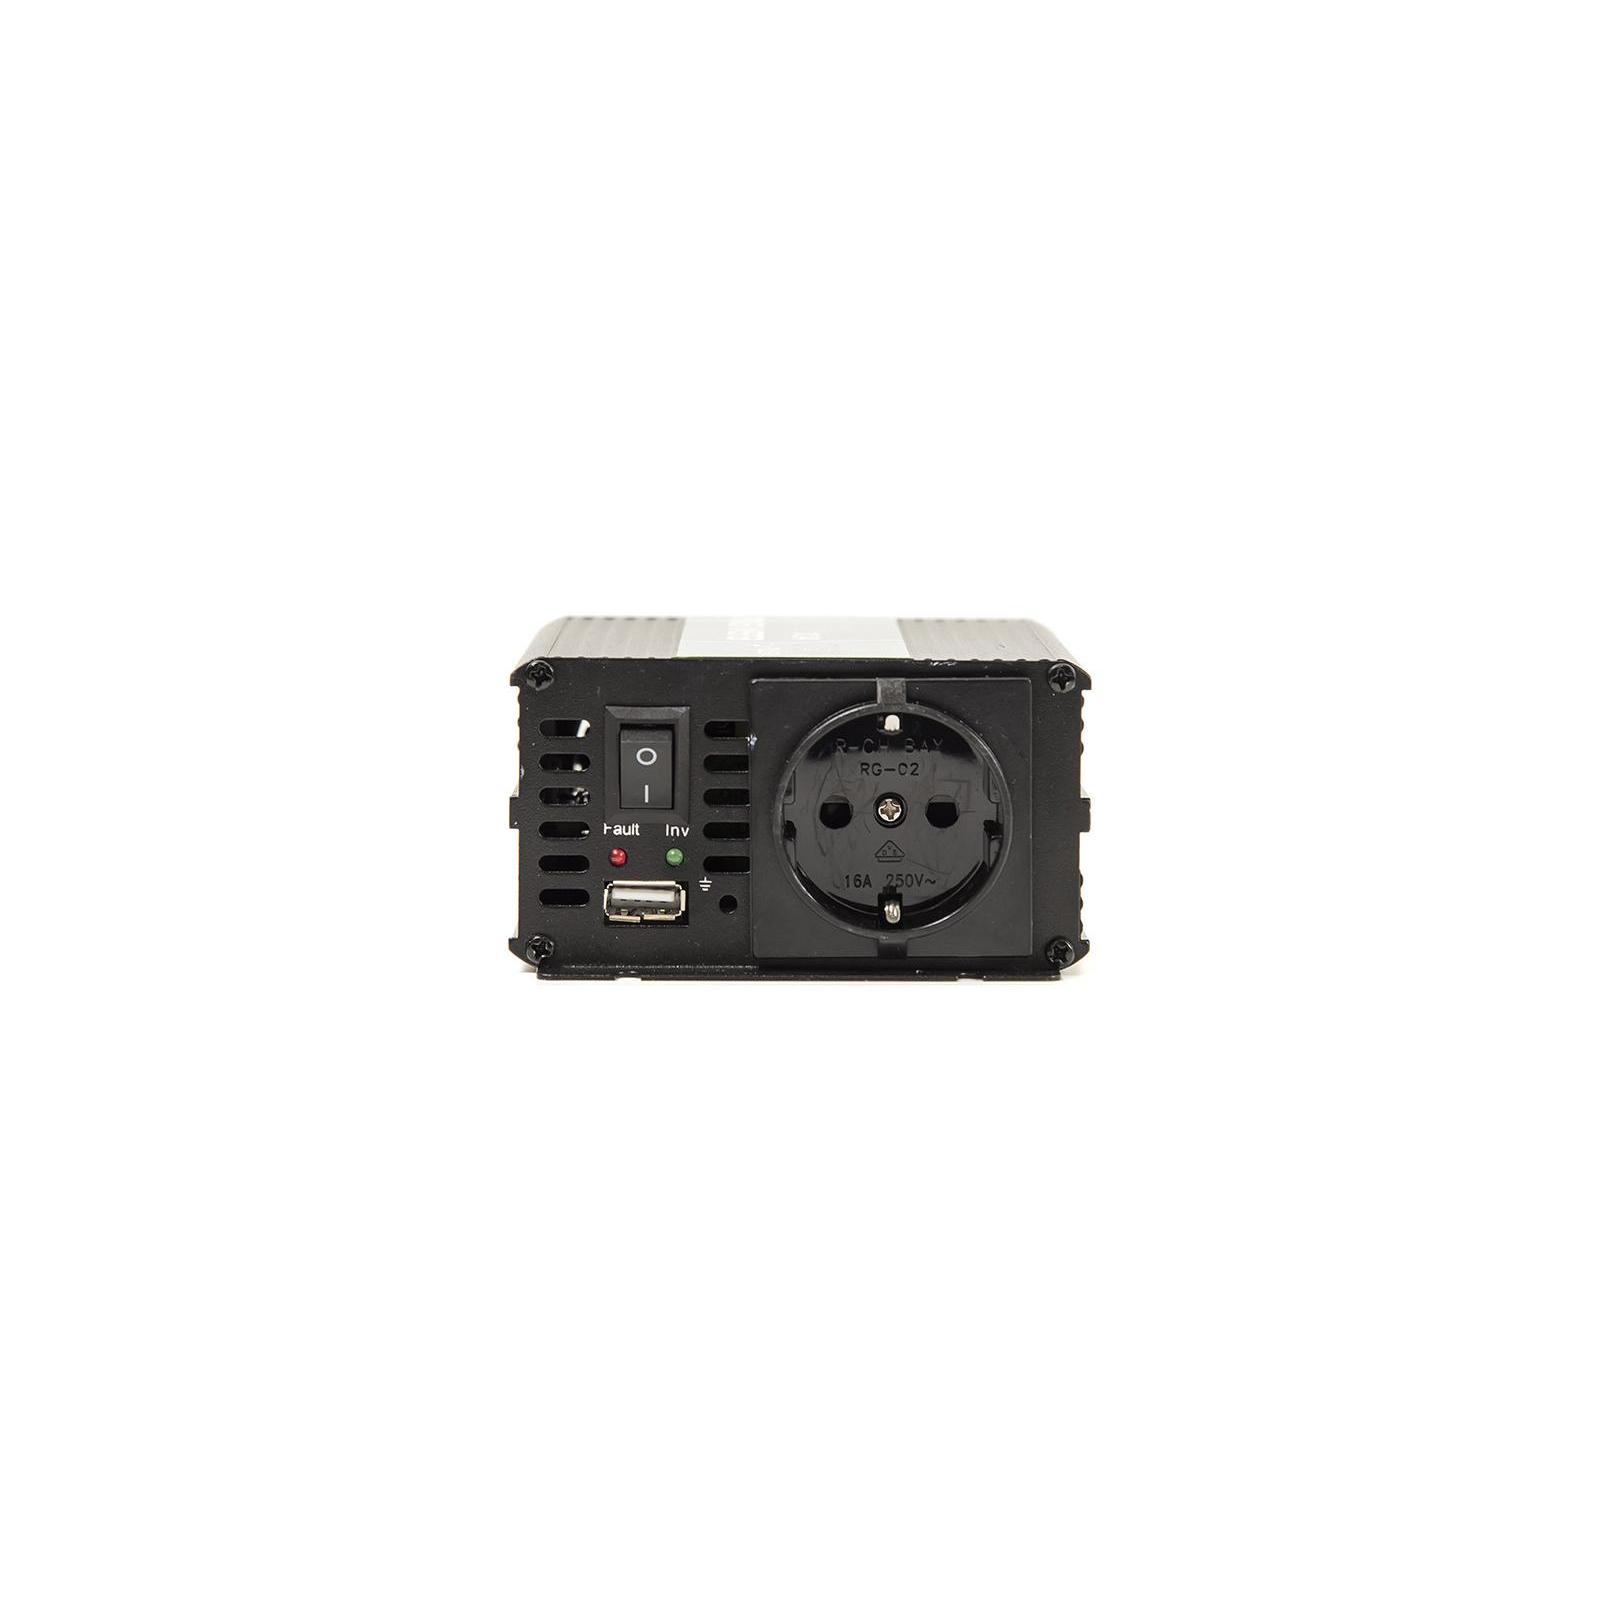 Автомобильный инвертор 24V/220V 300W, USB 5V 1A, HYM300-242 PowerPlant (KD00MS0002) изображение 5